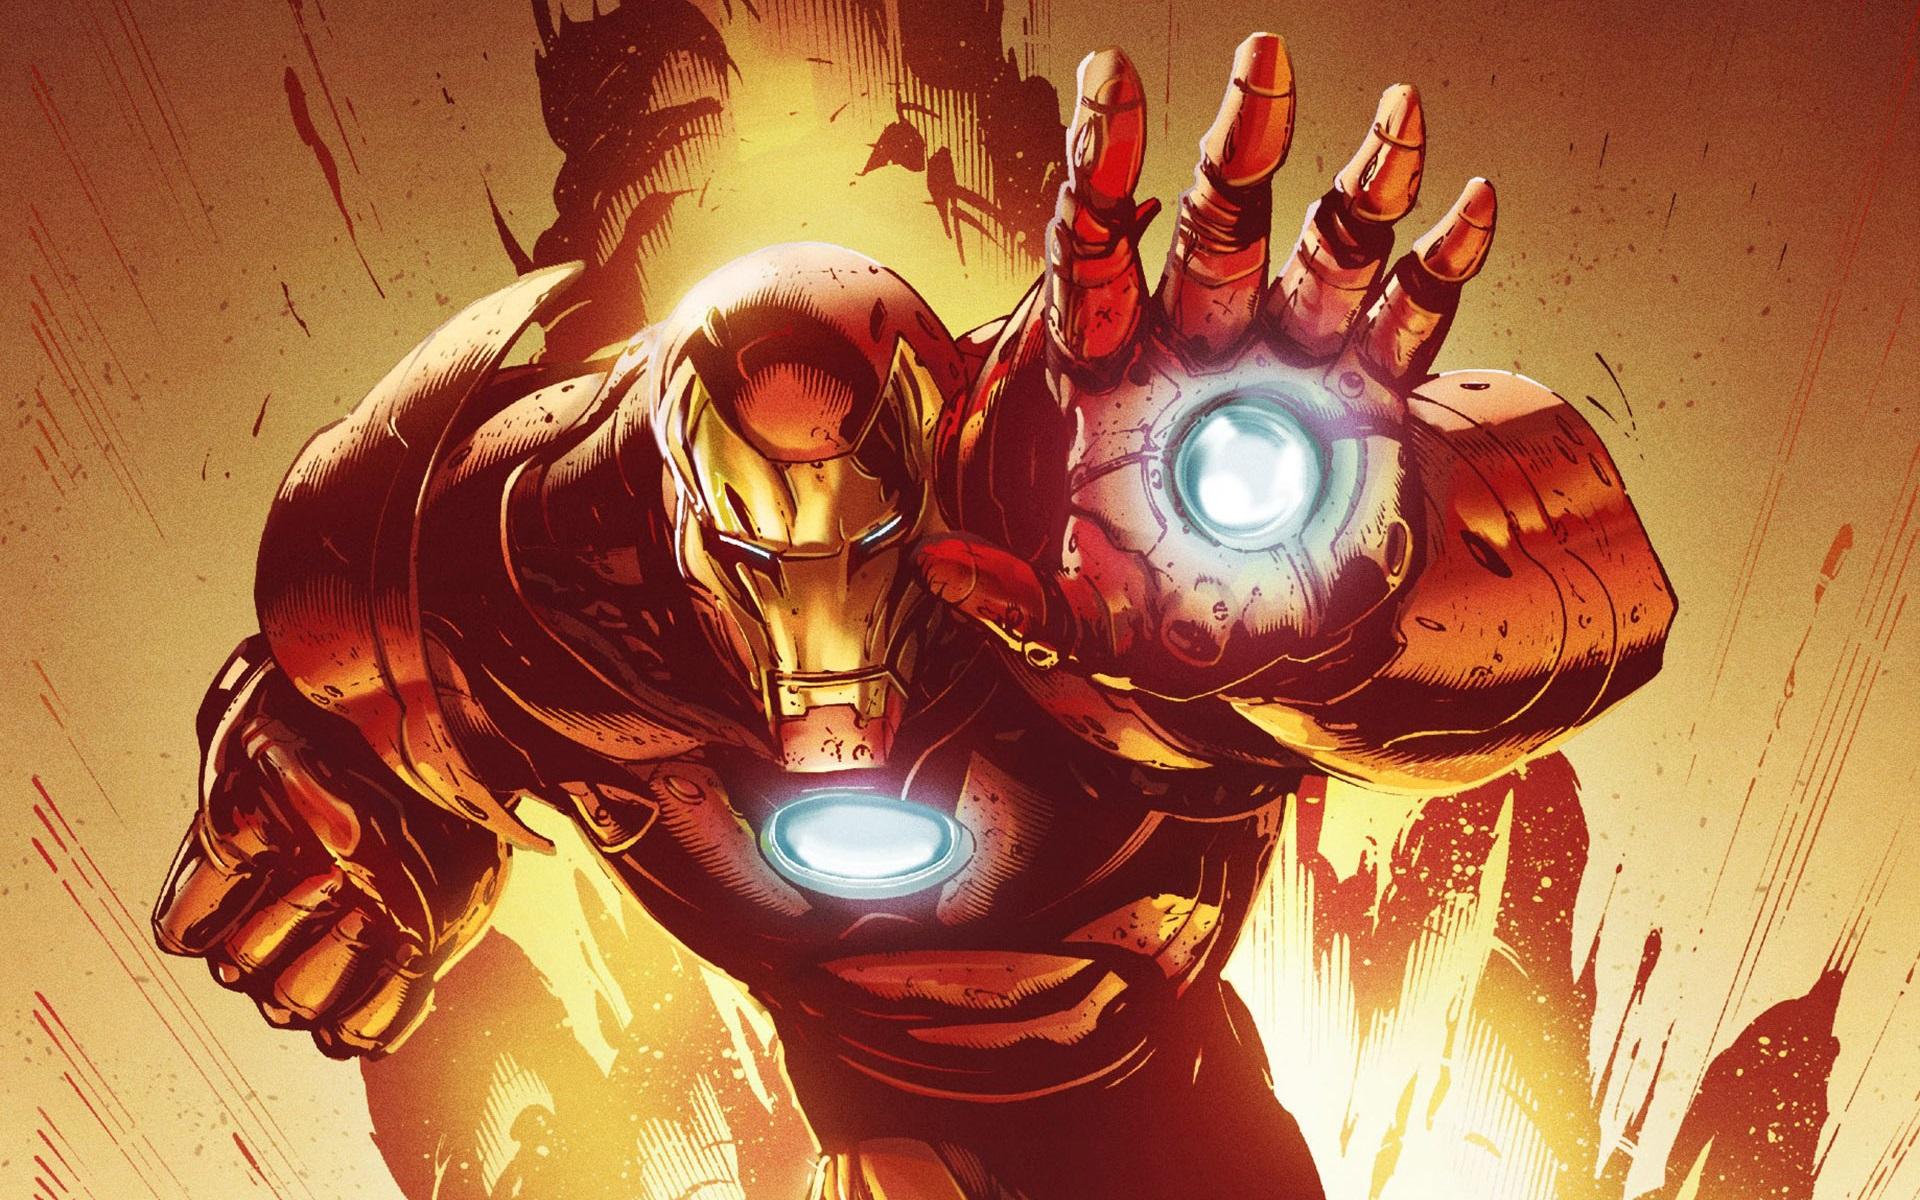 Fondos de pantalla iron man marvel comics imagen - Fondos de pantalla de iron man en 3d ...